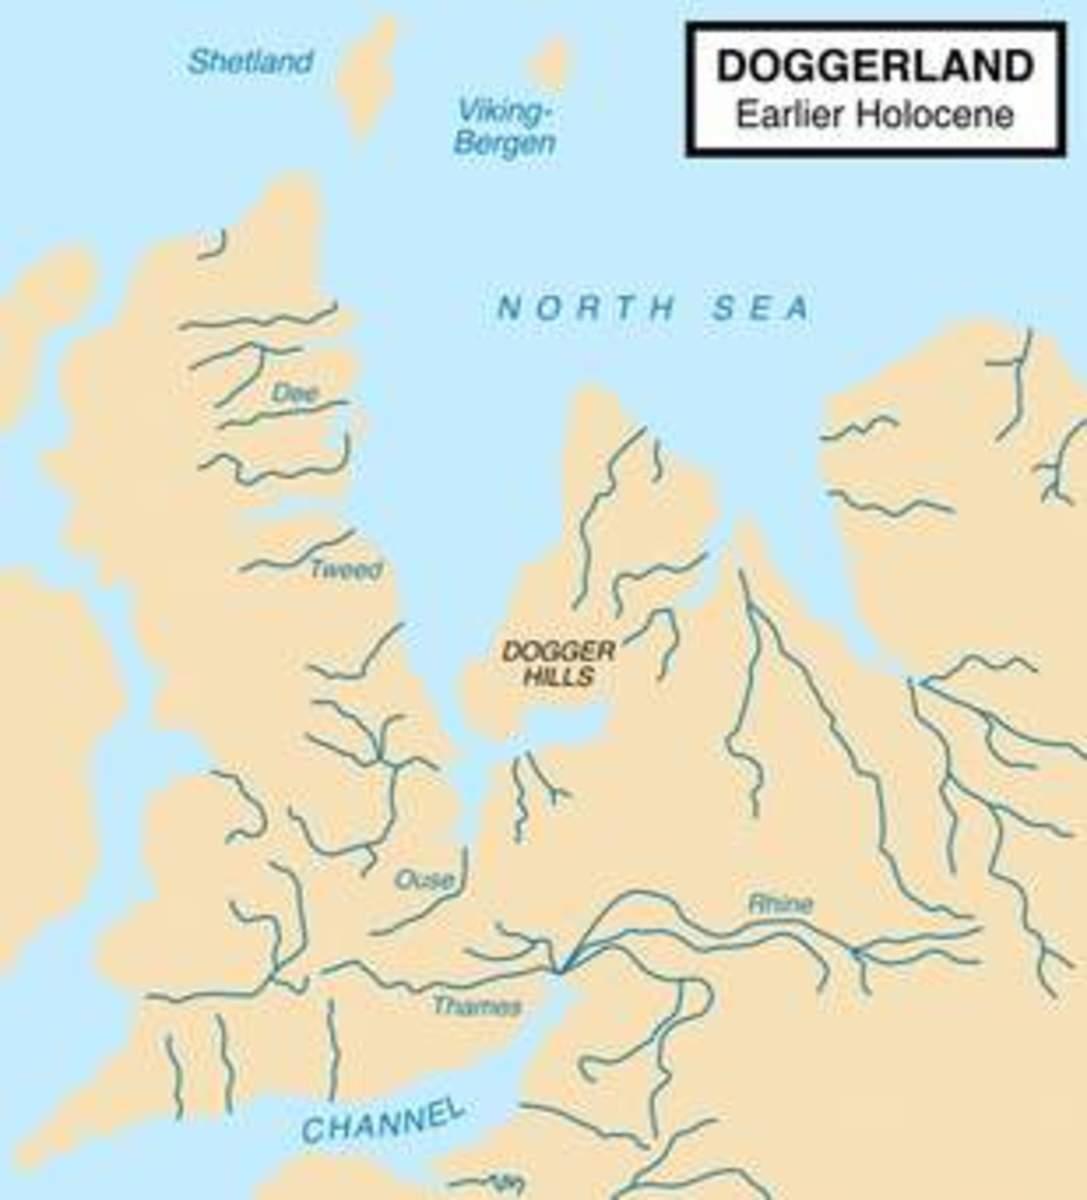 Main rivers that flowed through Doggerland